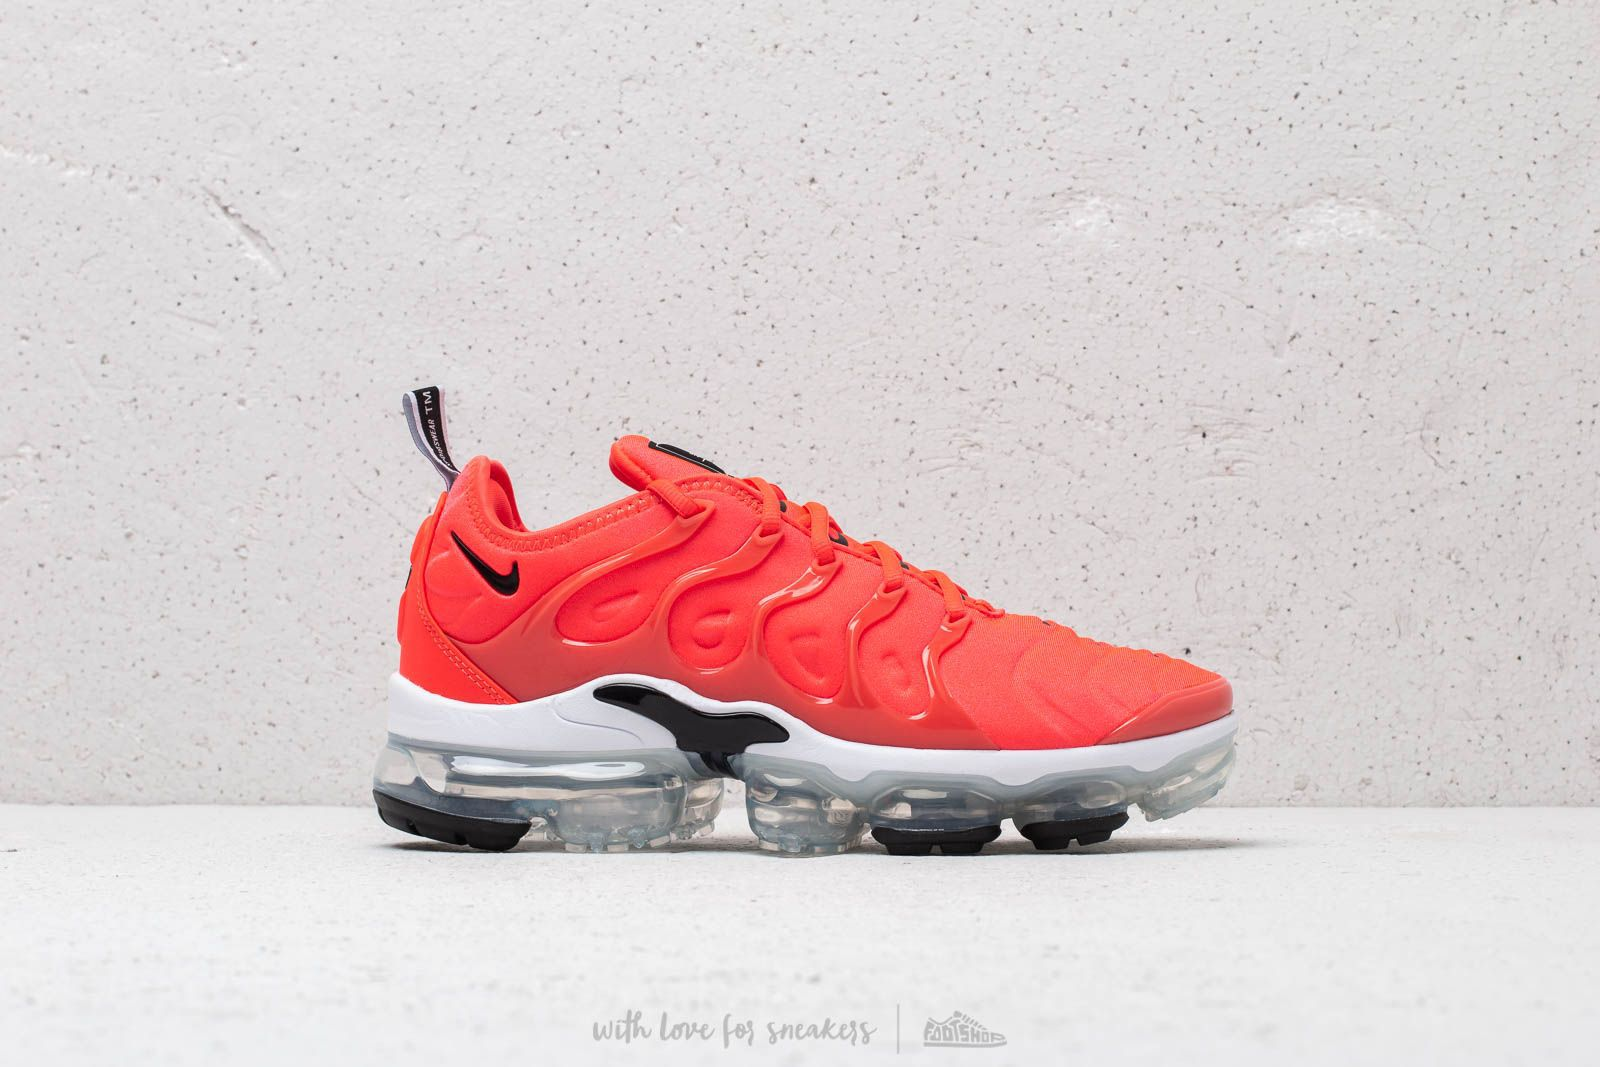 77abec866ee5 Nike Air Vapormax Plus Bright Crimson  Black-White at a great price 209 €